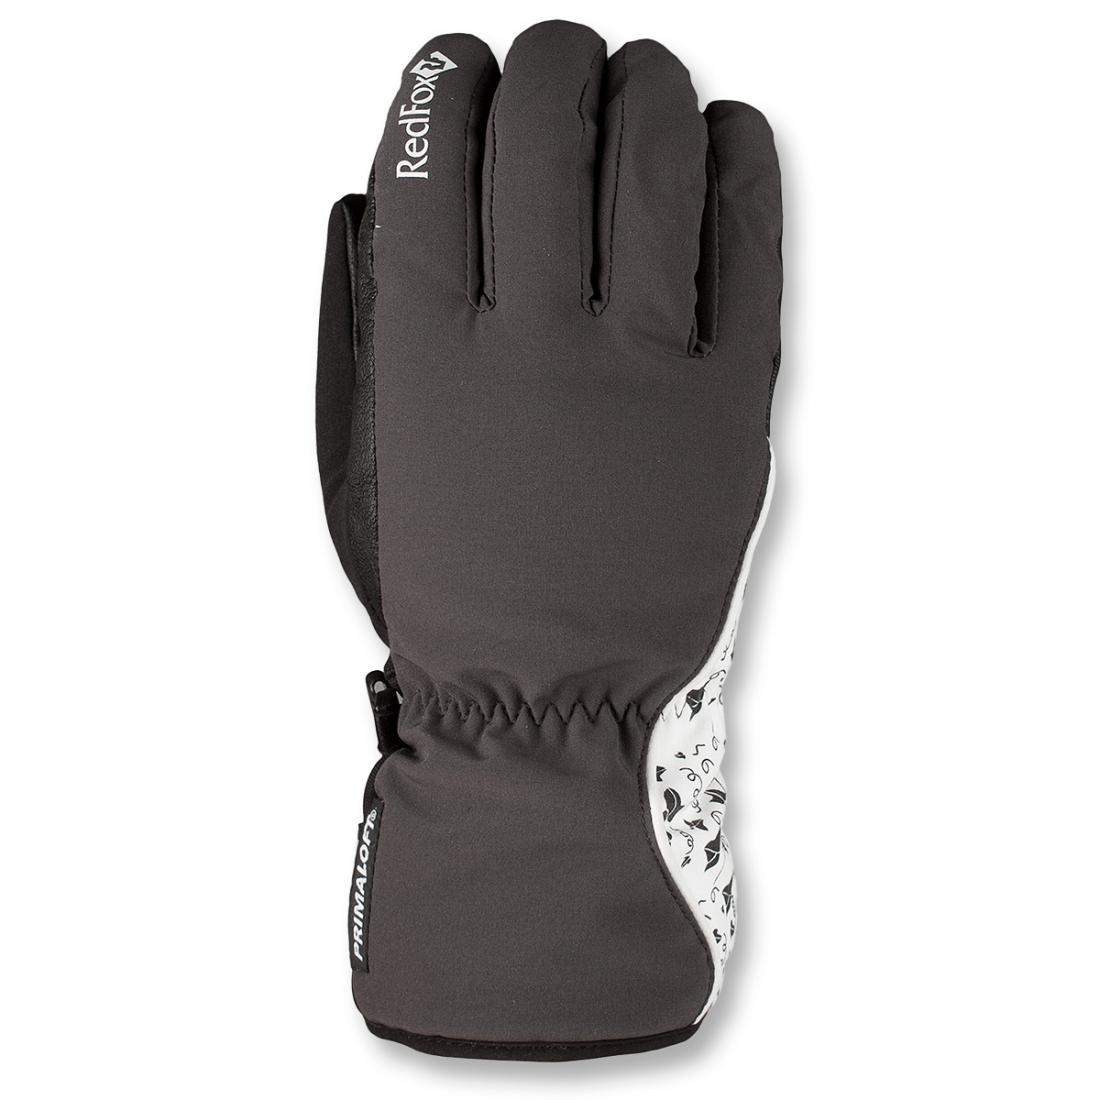 Перчатки женские RozaryПерчатки<br><br> Женская версия зимних прогулочных перчаток с утеплителем Primaloft®.<br><br><br> <br><br><br><br><br> Материал – Nylon DWR.<br><br> <br><br><br> Утеплитель – Primaloft®.<br><br> <br><br><br> Вставки, препятствующ...<br><br>Цвет: Белый<br>Размер: L